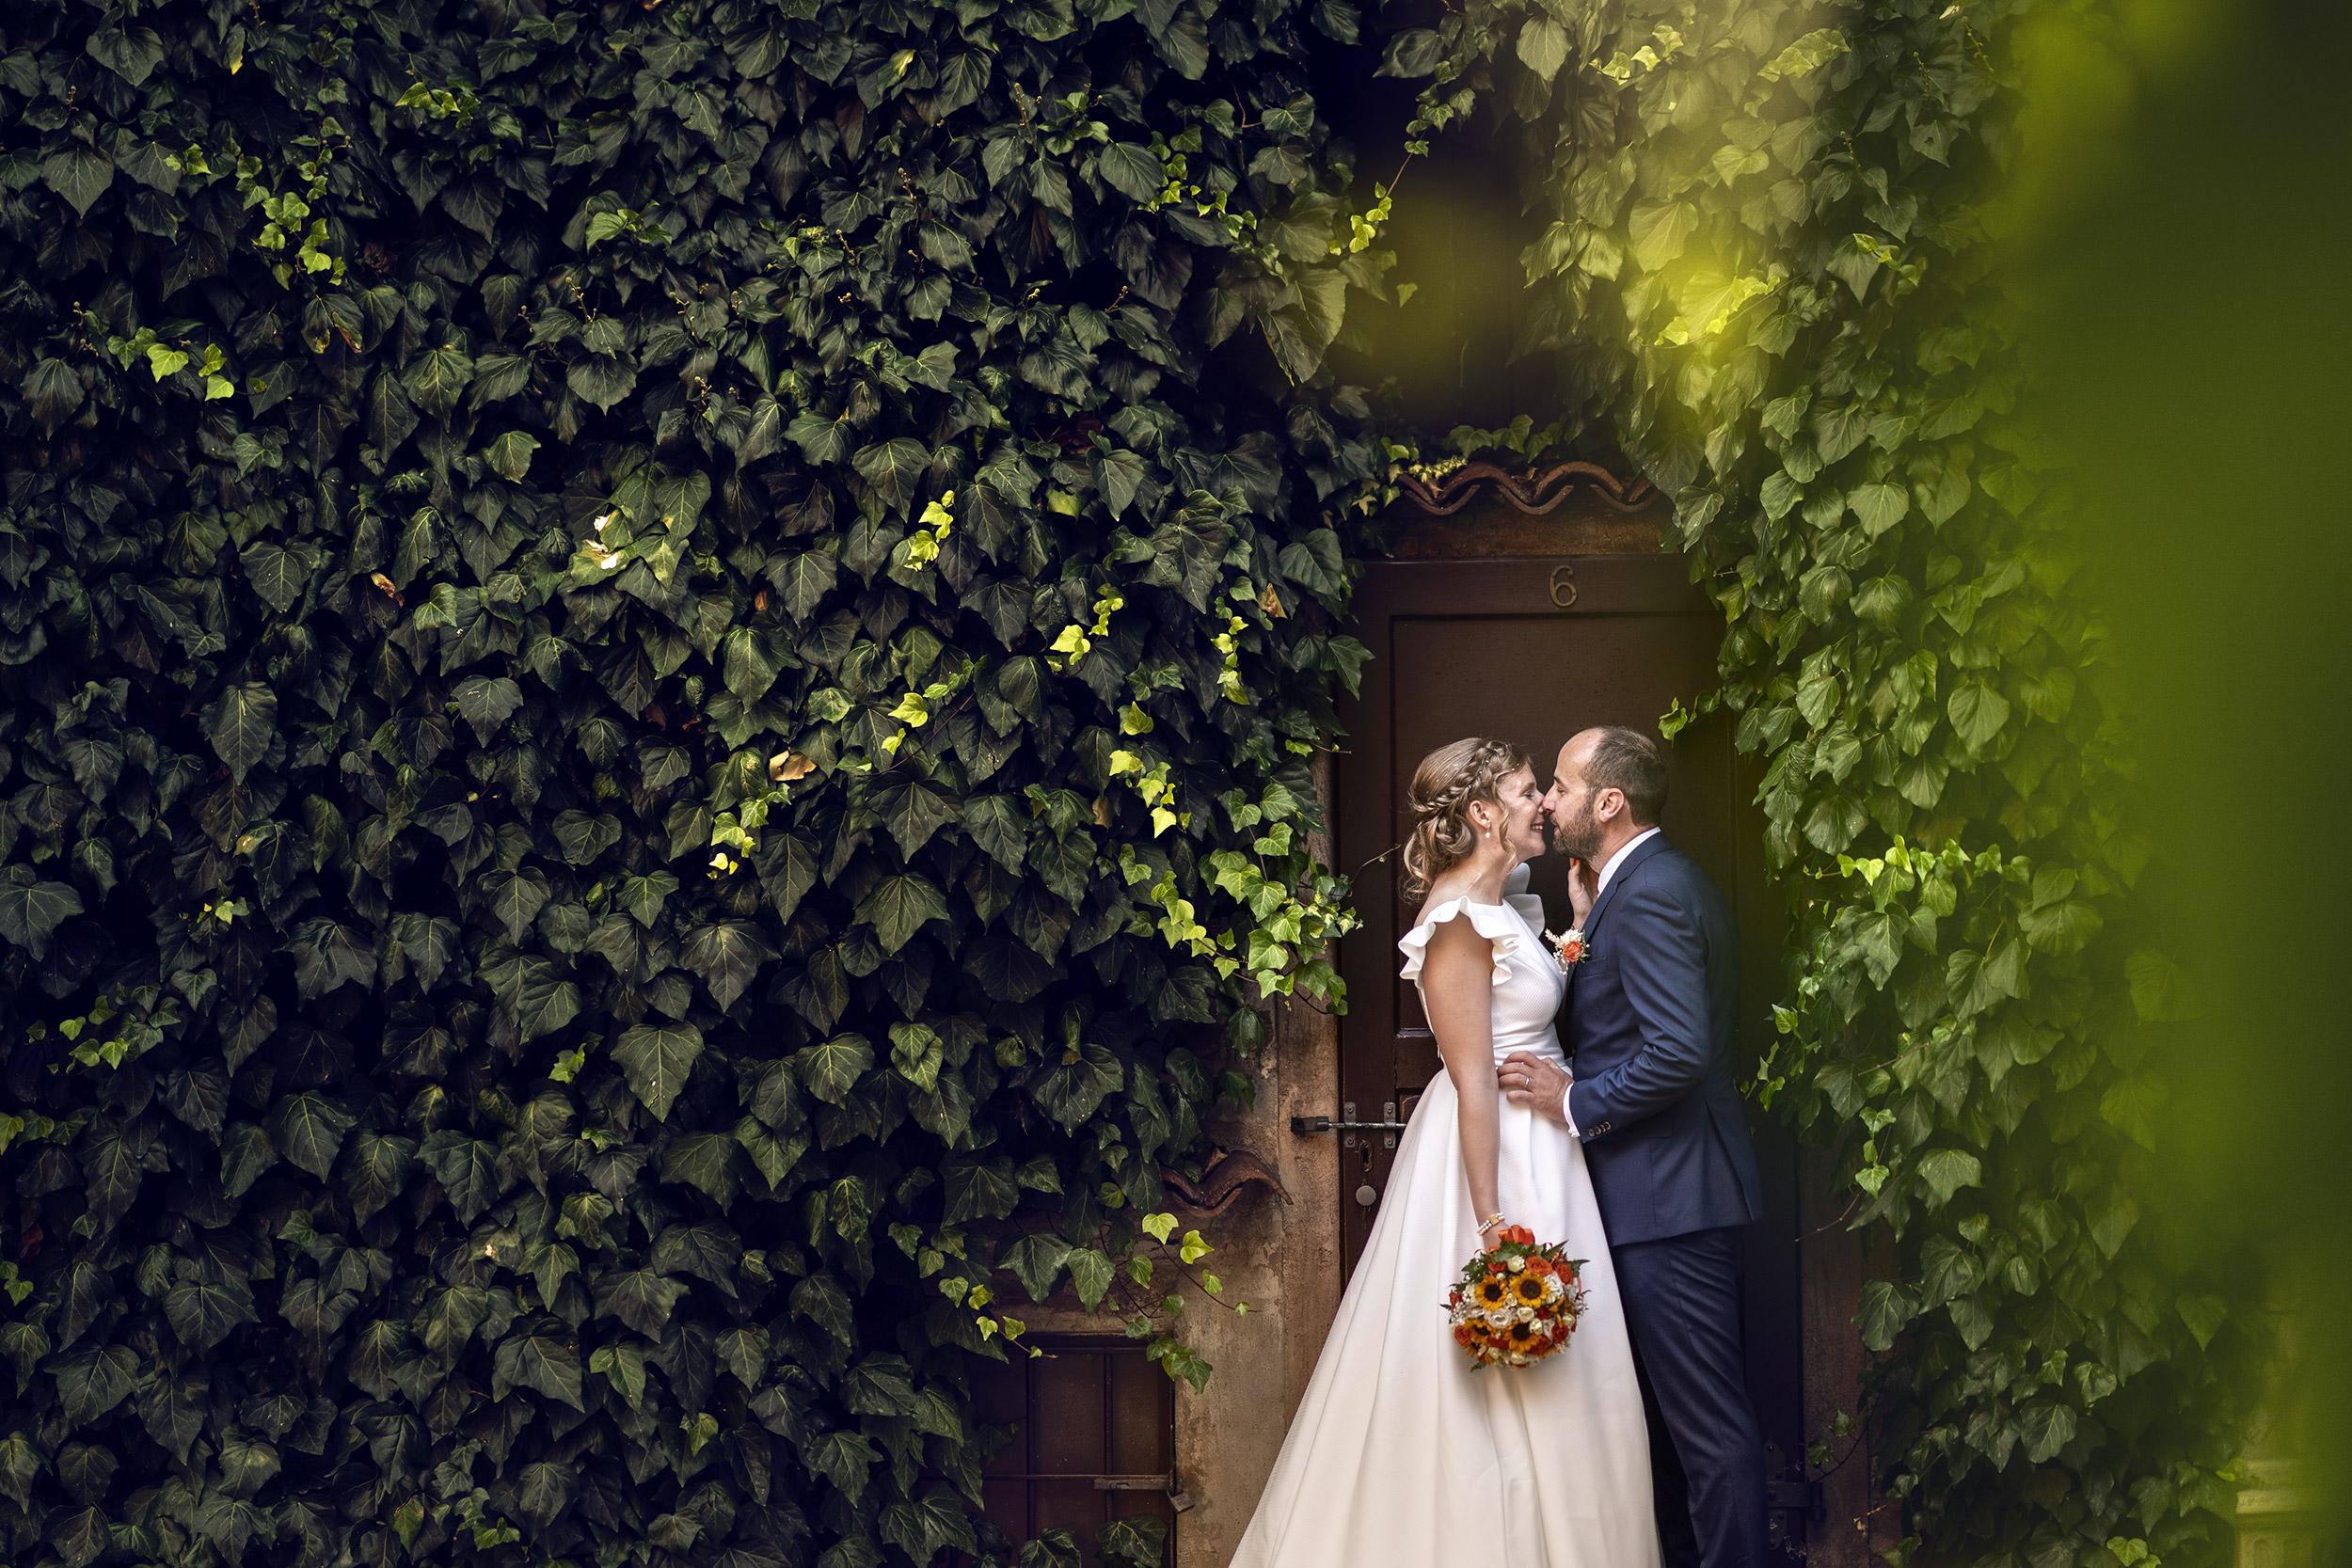 000 reportage wedding sposi foto matrimonio castello marigolda curno bergamo copia 1